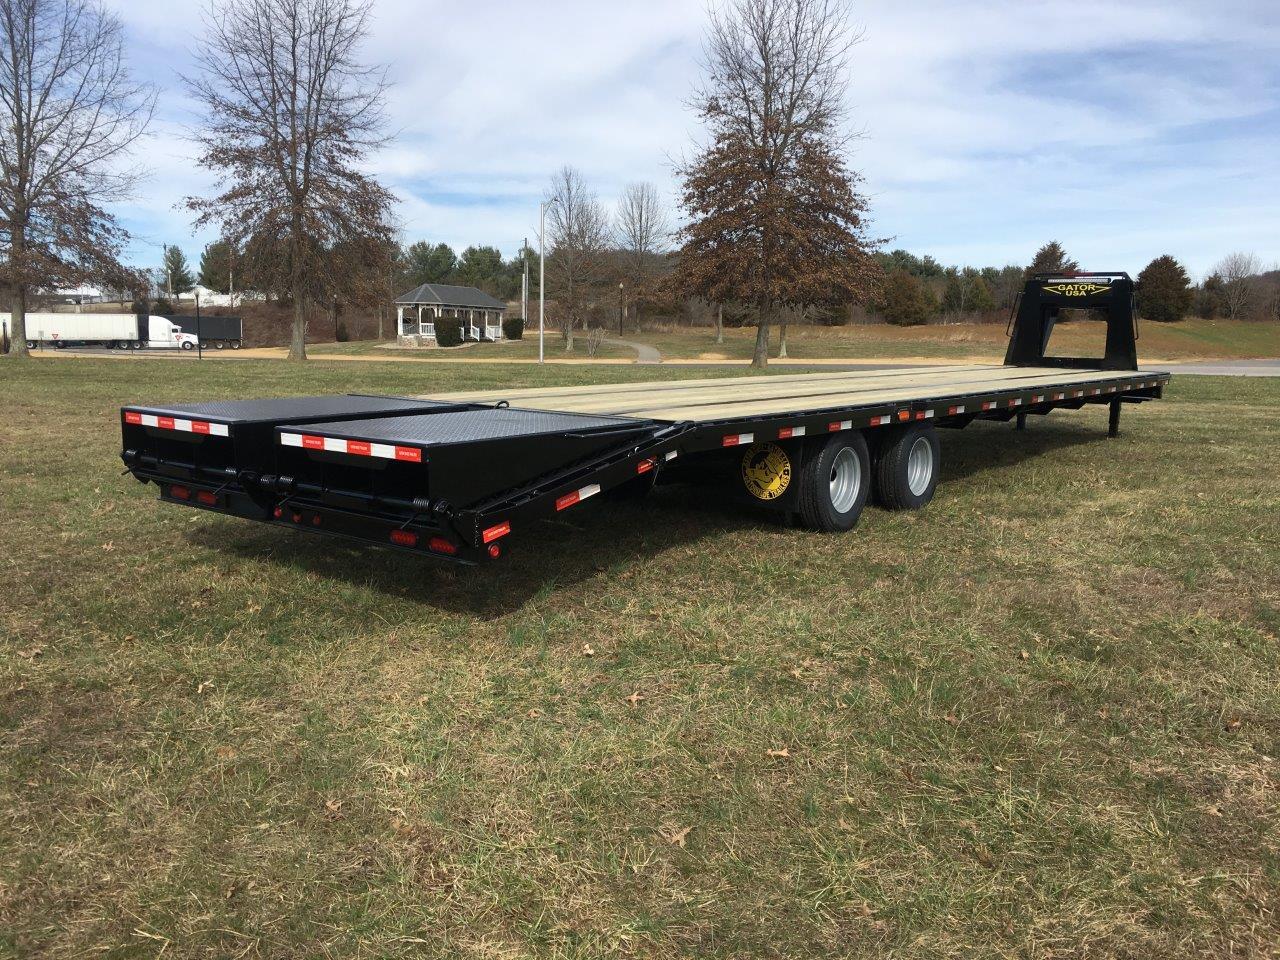 top hat trailer wiring diagram coil split 7 pin 18 wheeler end of a truck